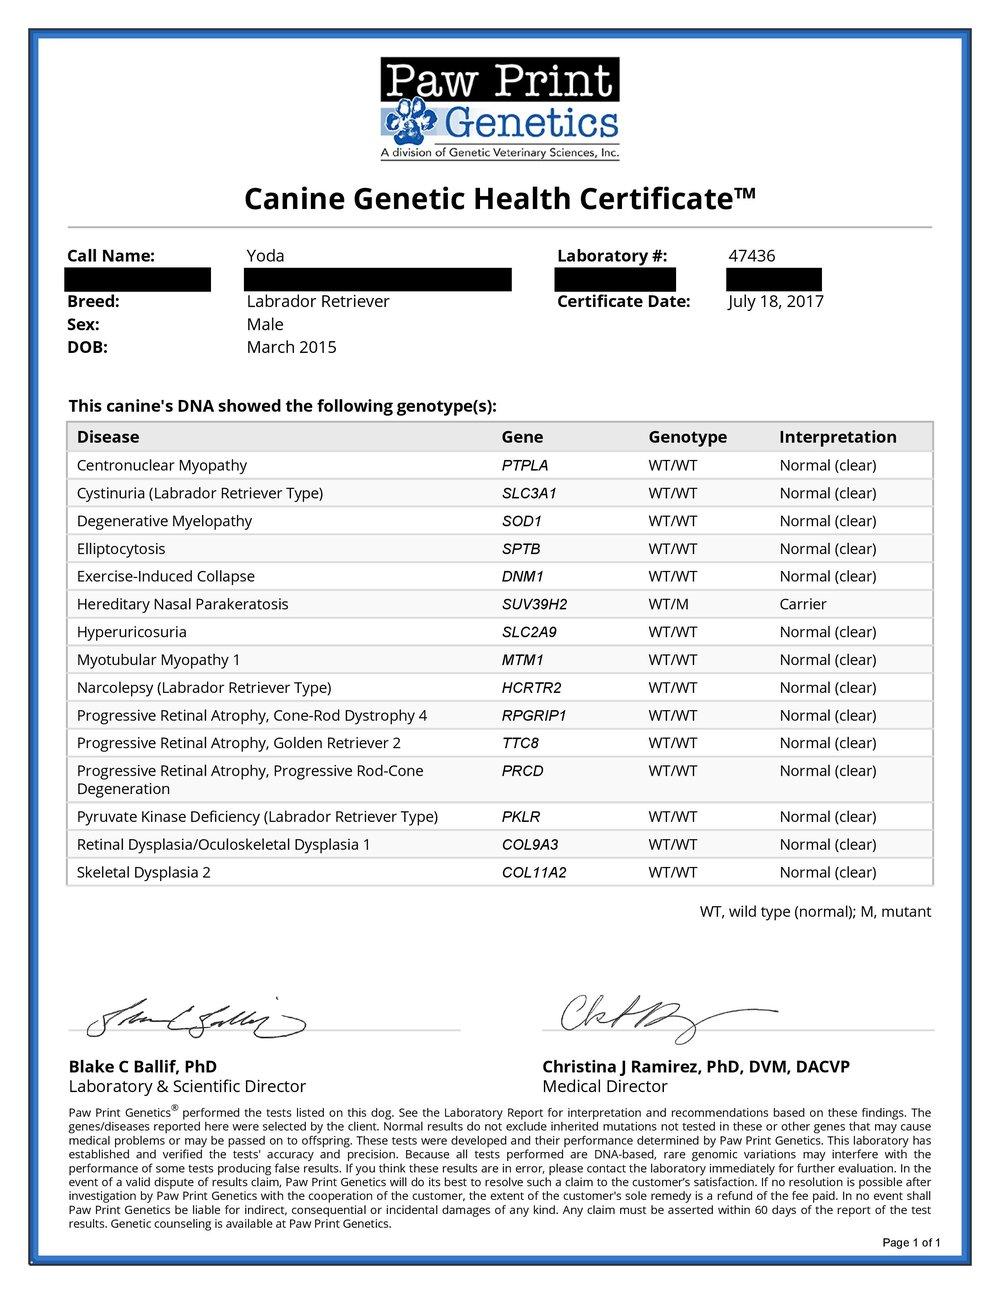 Yoda_Health_Cert-page-001.jpg